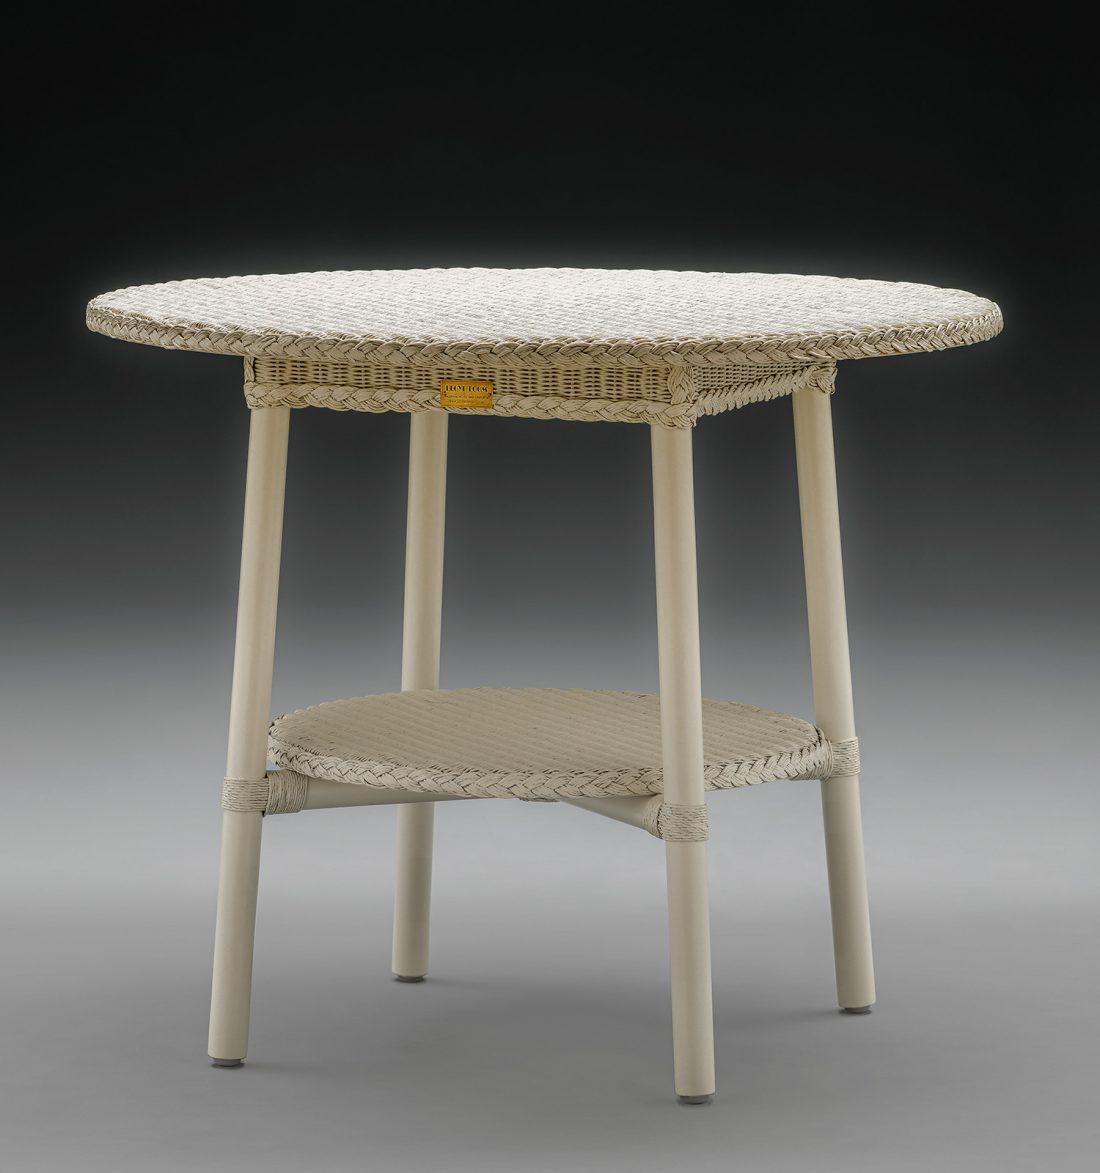 Lloyd Loom Café Table In Crisp Linen